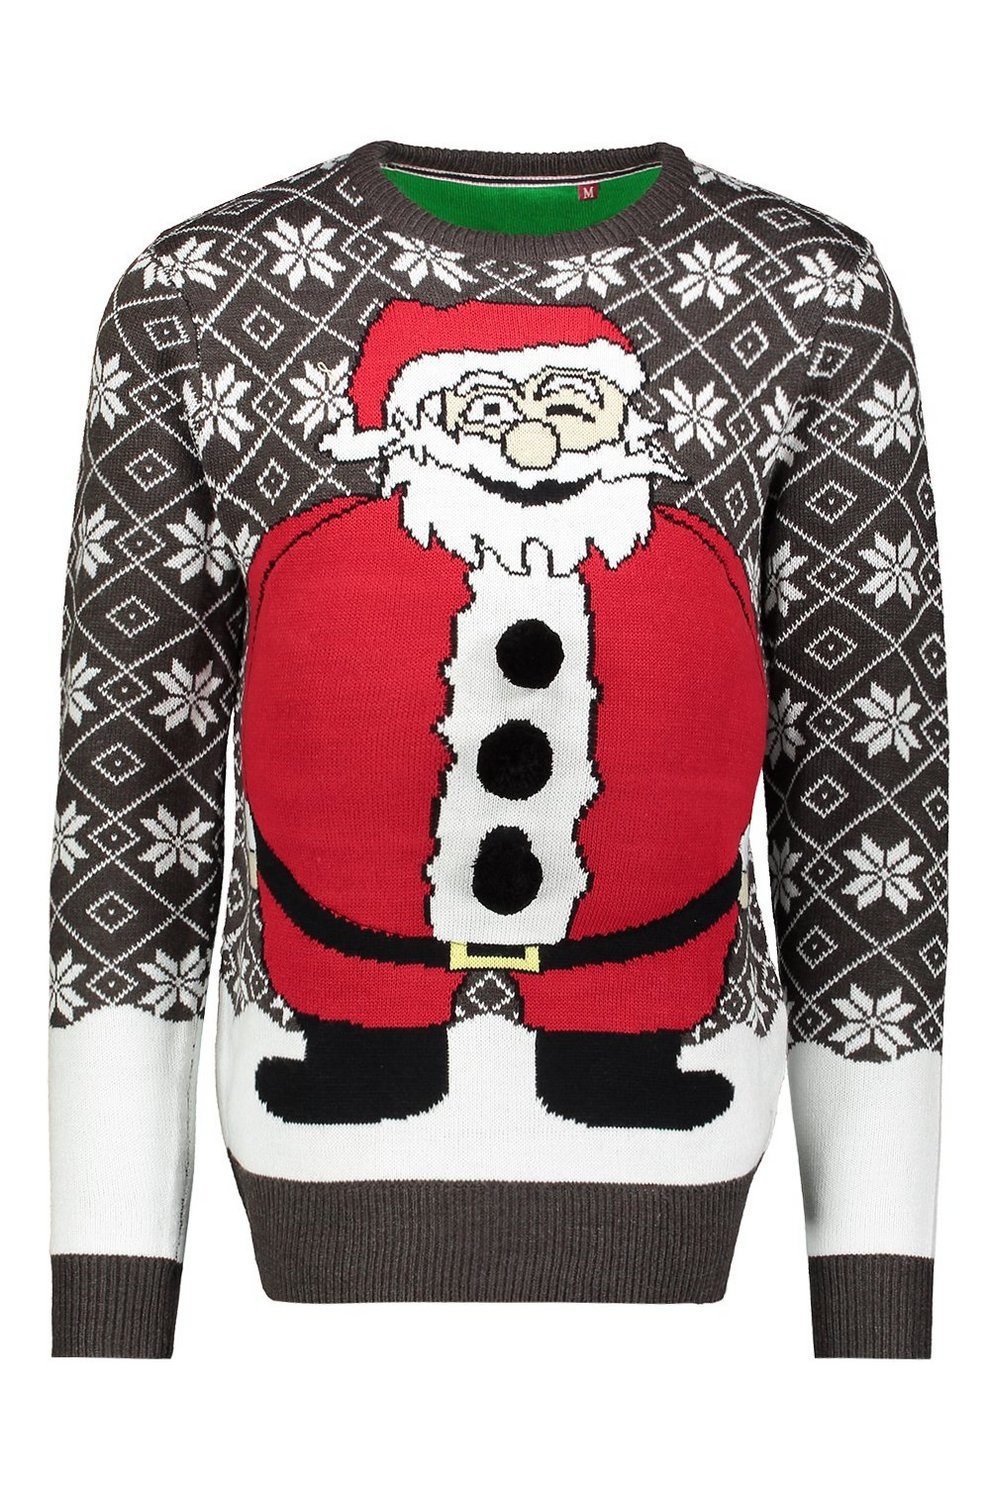 a0bfcc2efd4 Novelty Santa Belly Christmas Jumper - boohooMAN